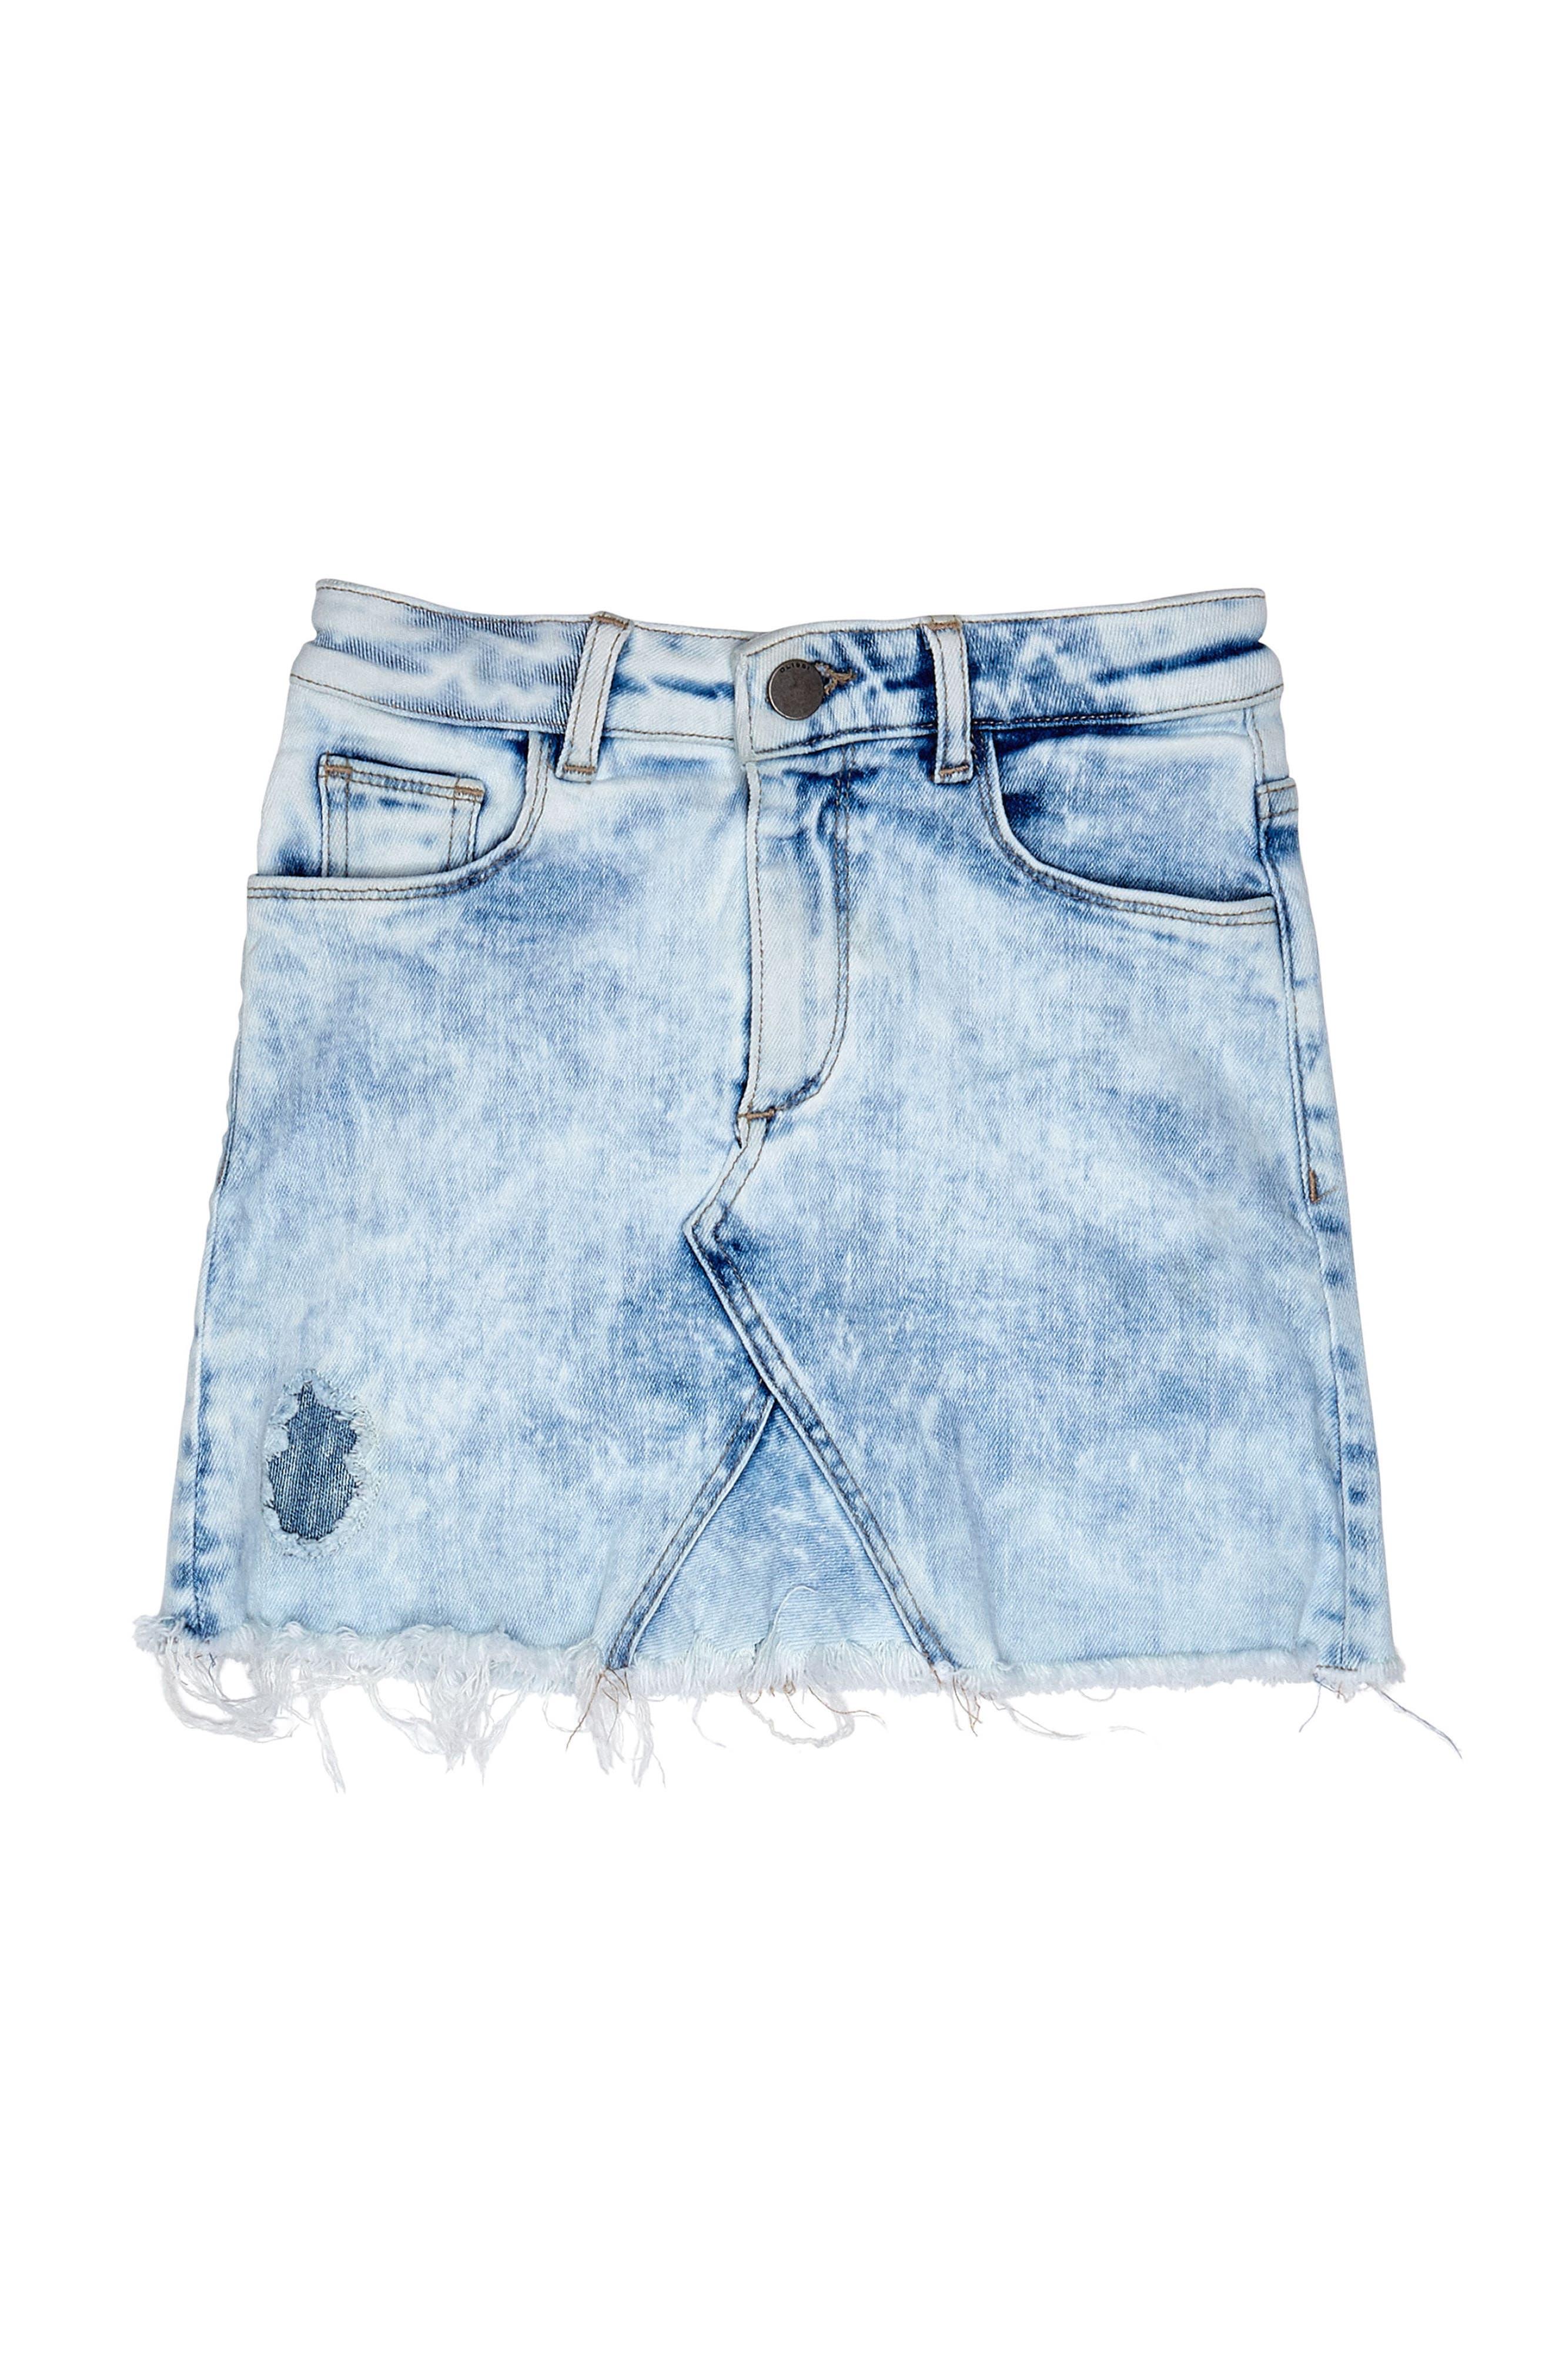 Cutoff Denim Skirt,                             Main thumbnail 1, color,                             430